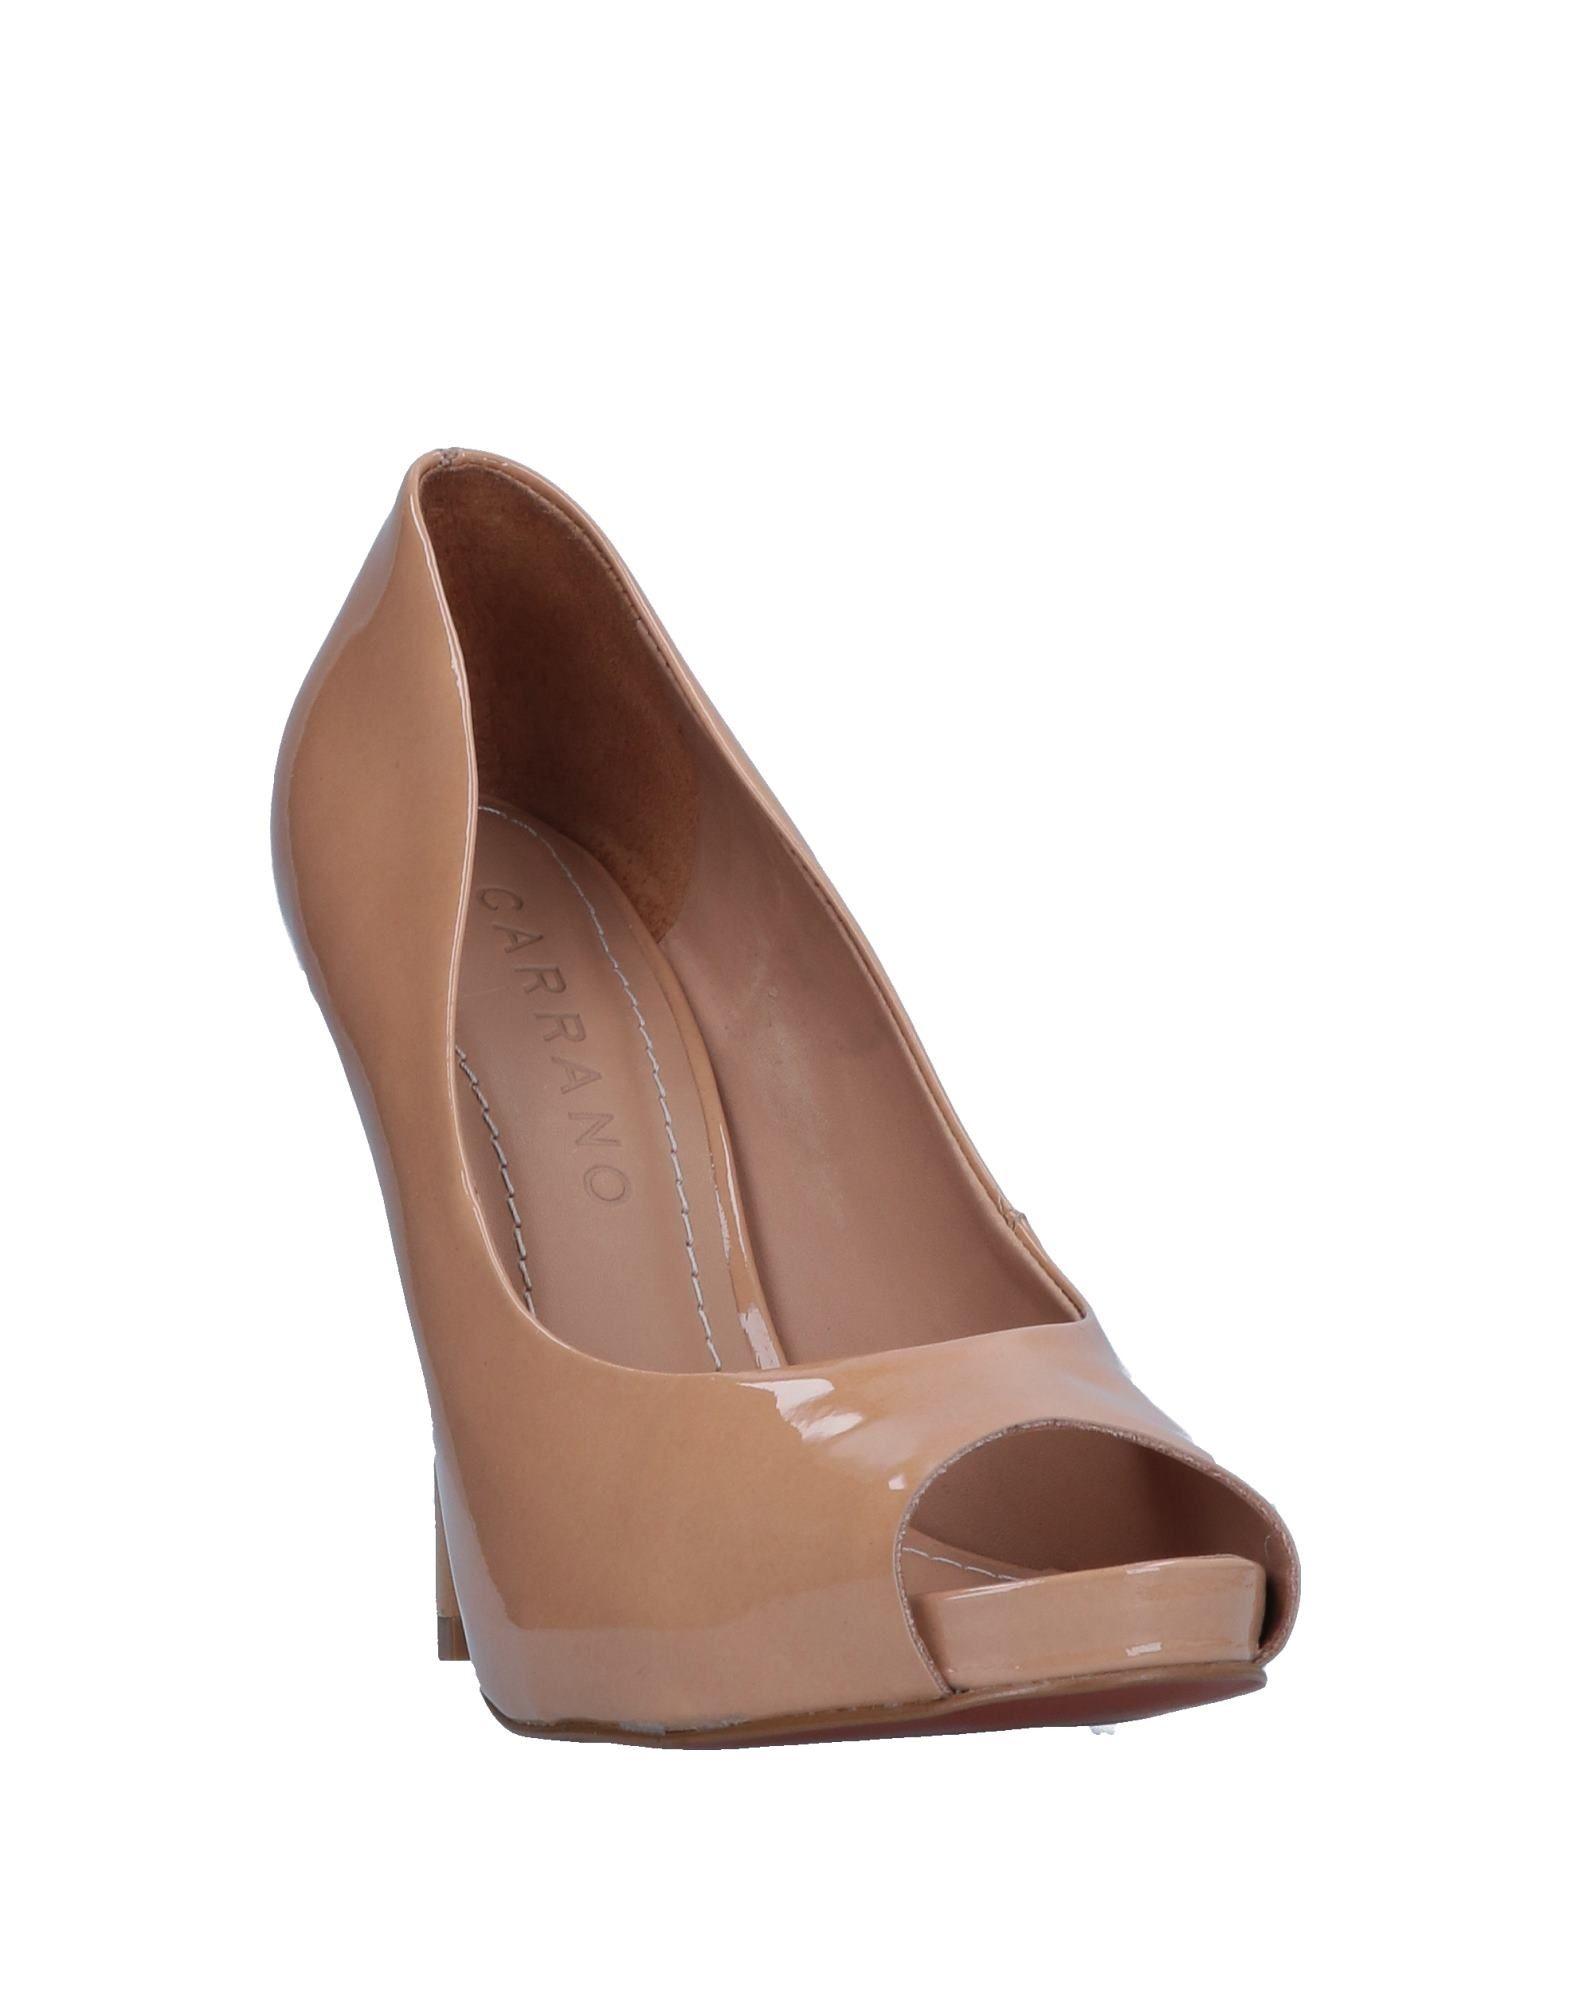 Carrano Pumps Damen  11544335AL Schuhe Gute Qualität beliebte Schuhe 11544335AL 924570